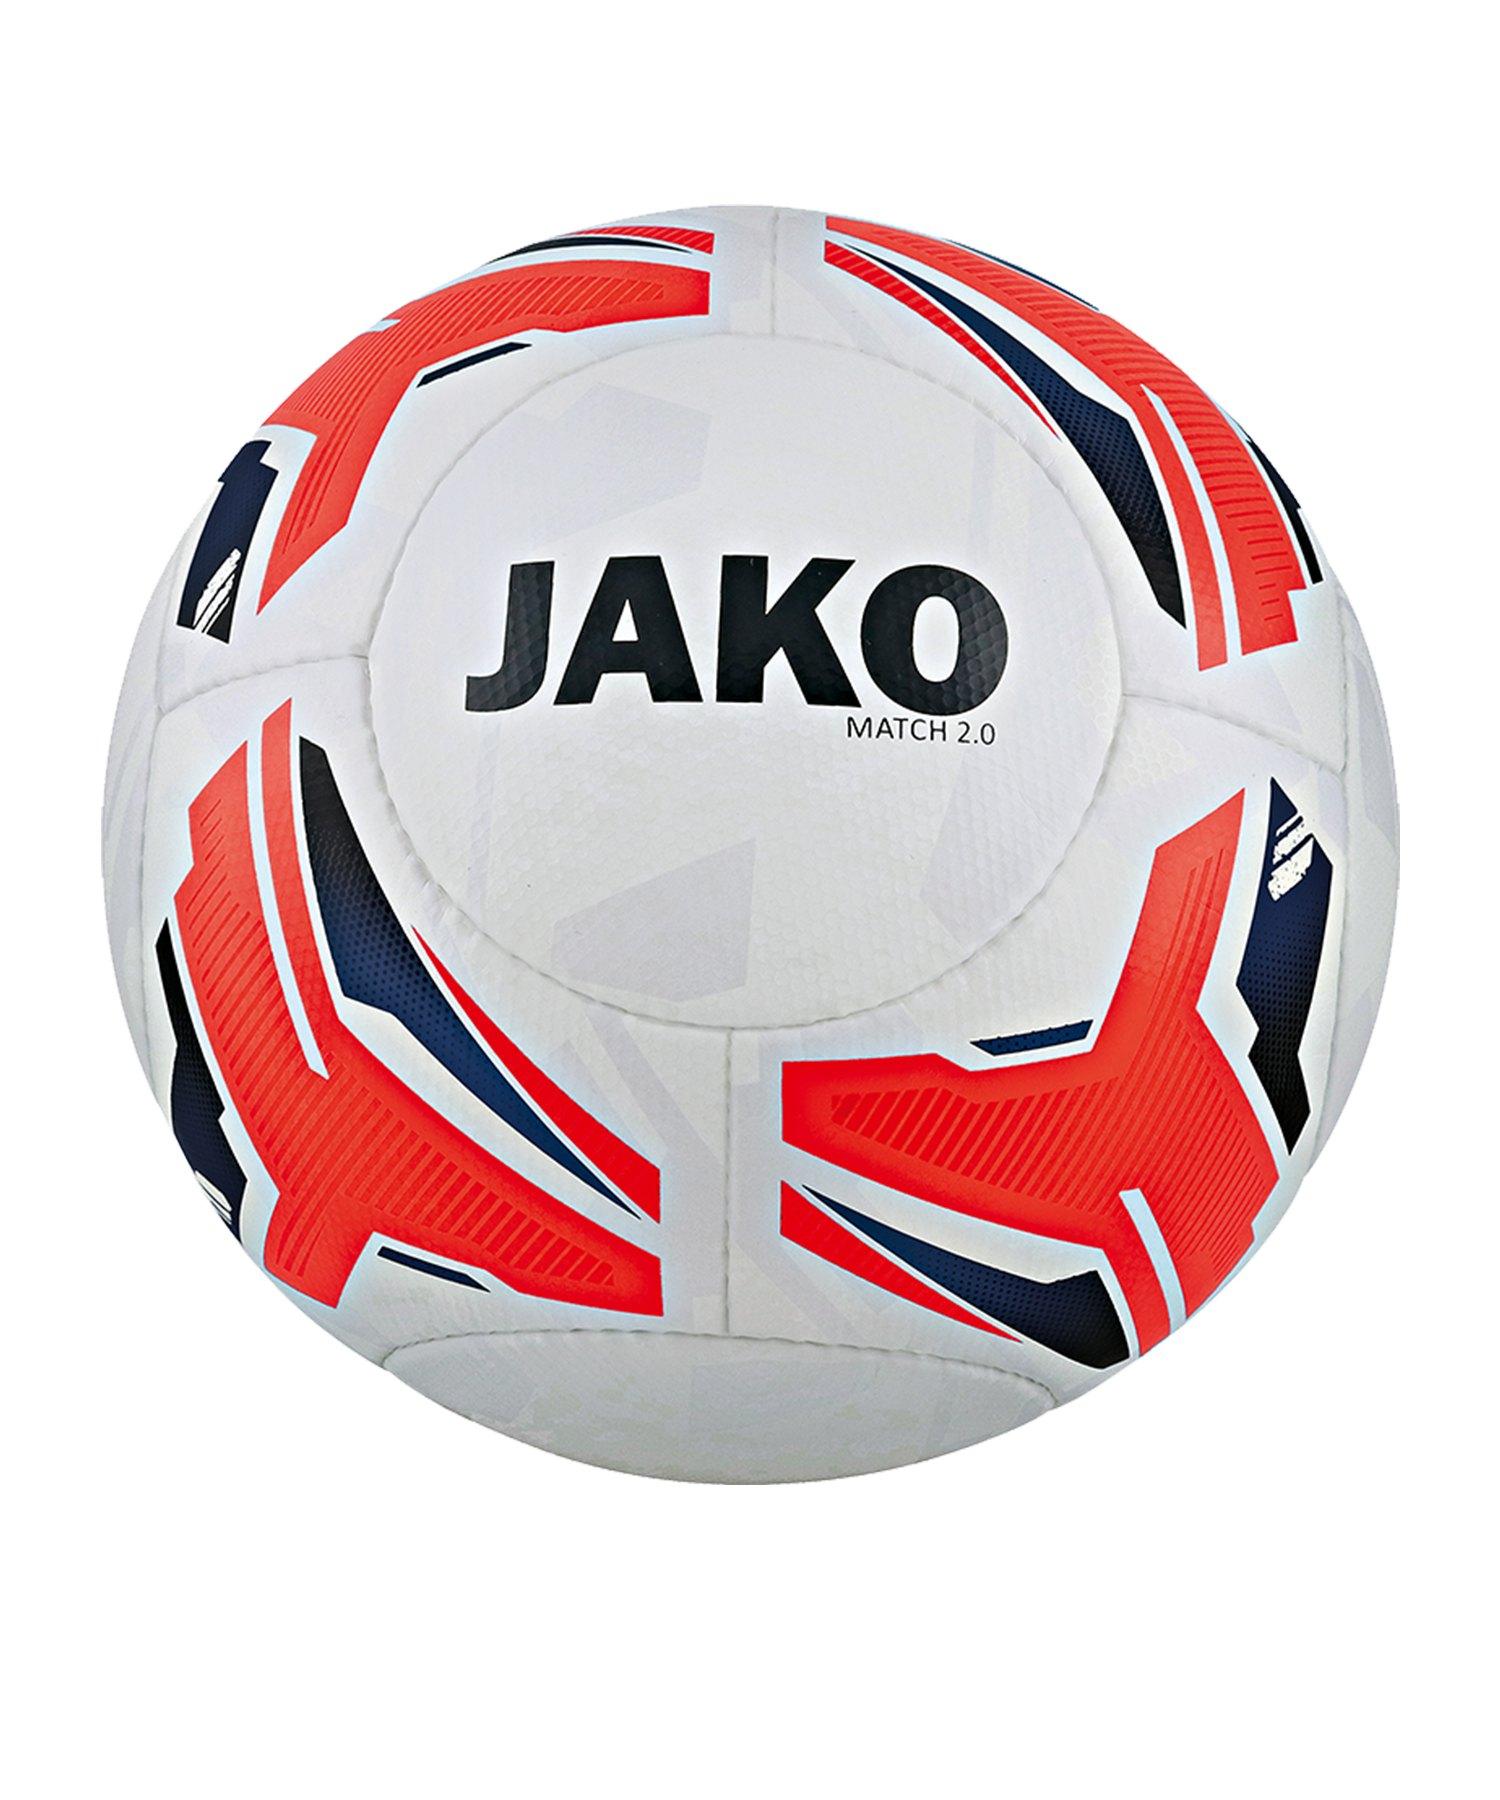 Jako Match 2.0 Trainingsball Weiss Orange Blau F23 - Weiss